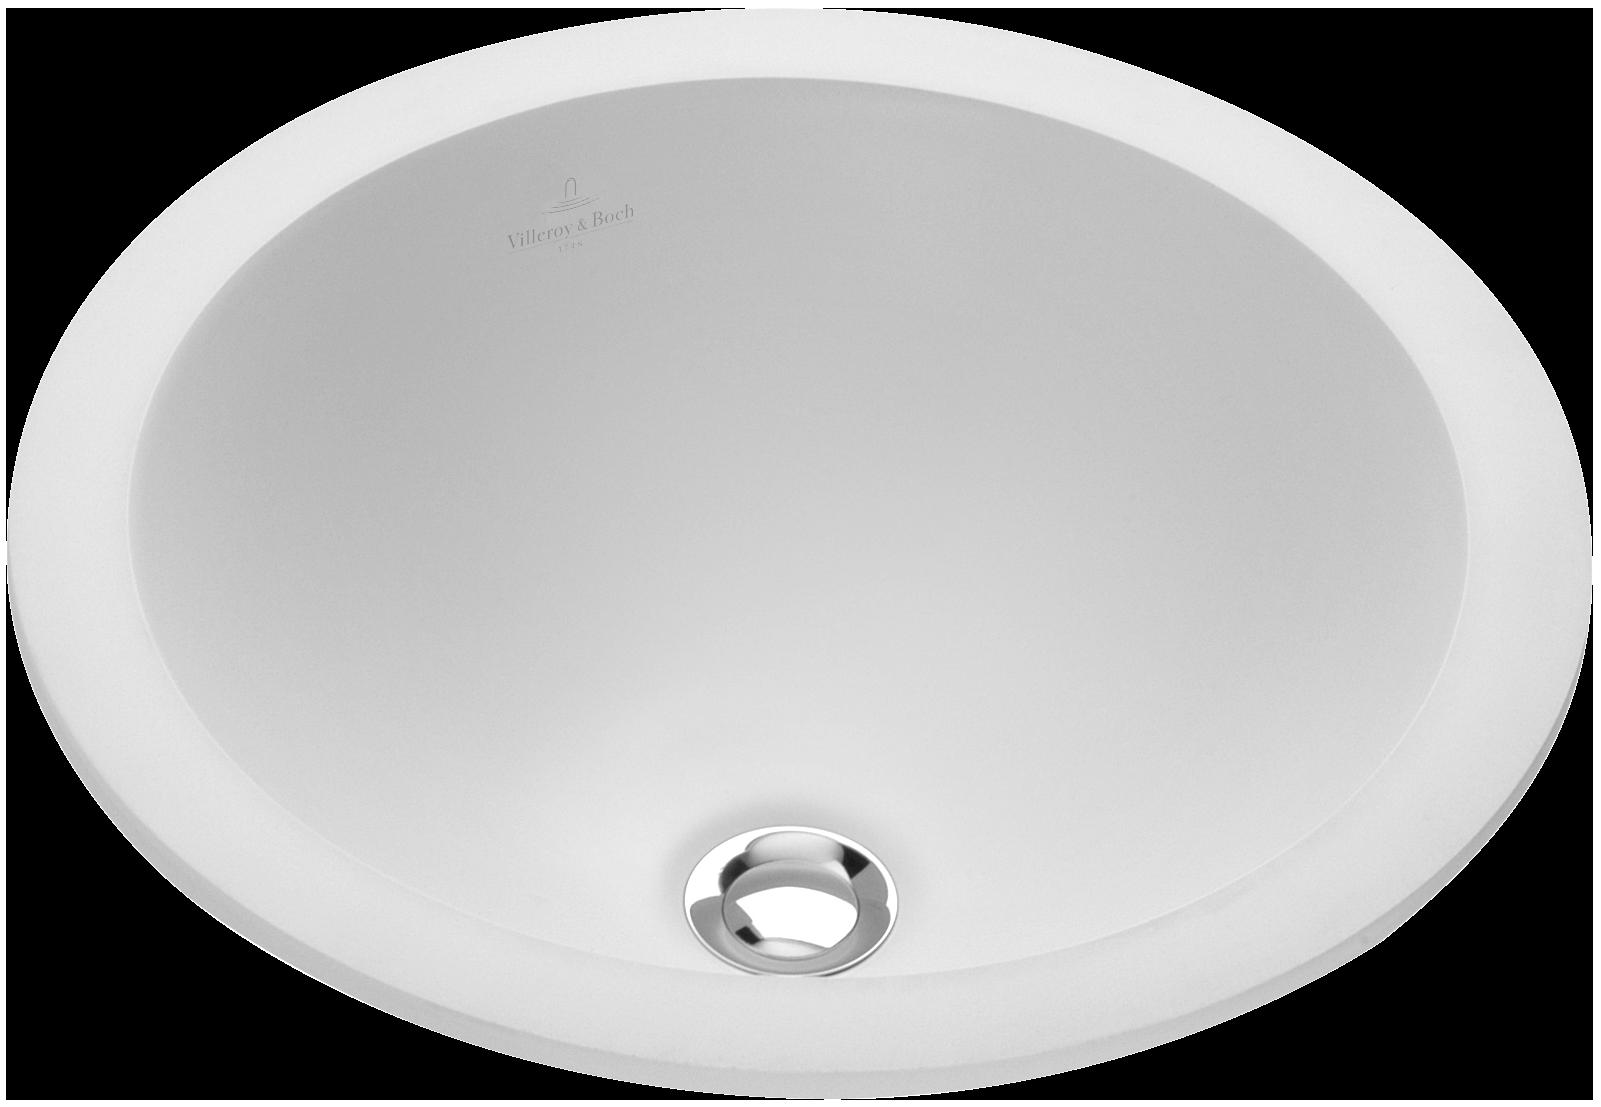 loop friends drop in washbasin round round 6140u0 villeroy boch. Black Bedroom Furniture Sets. Home Design Ideas